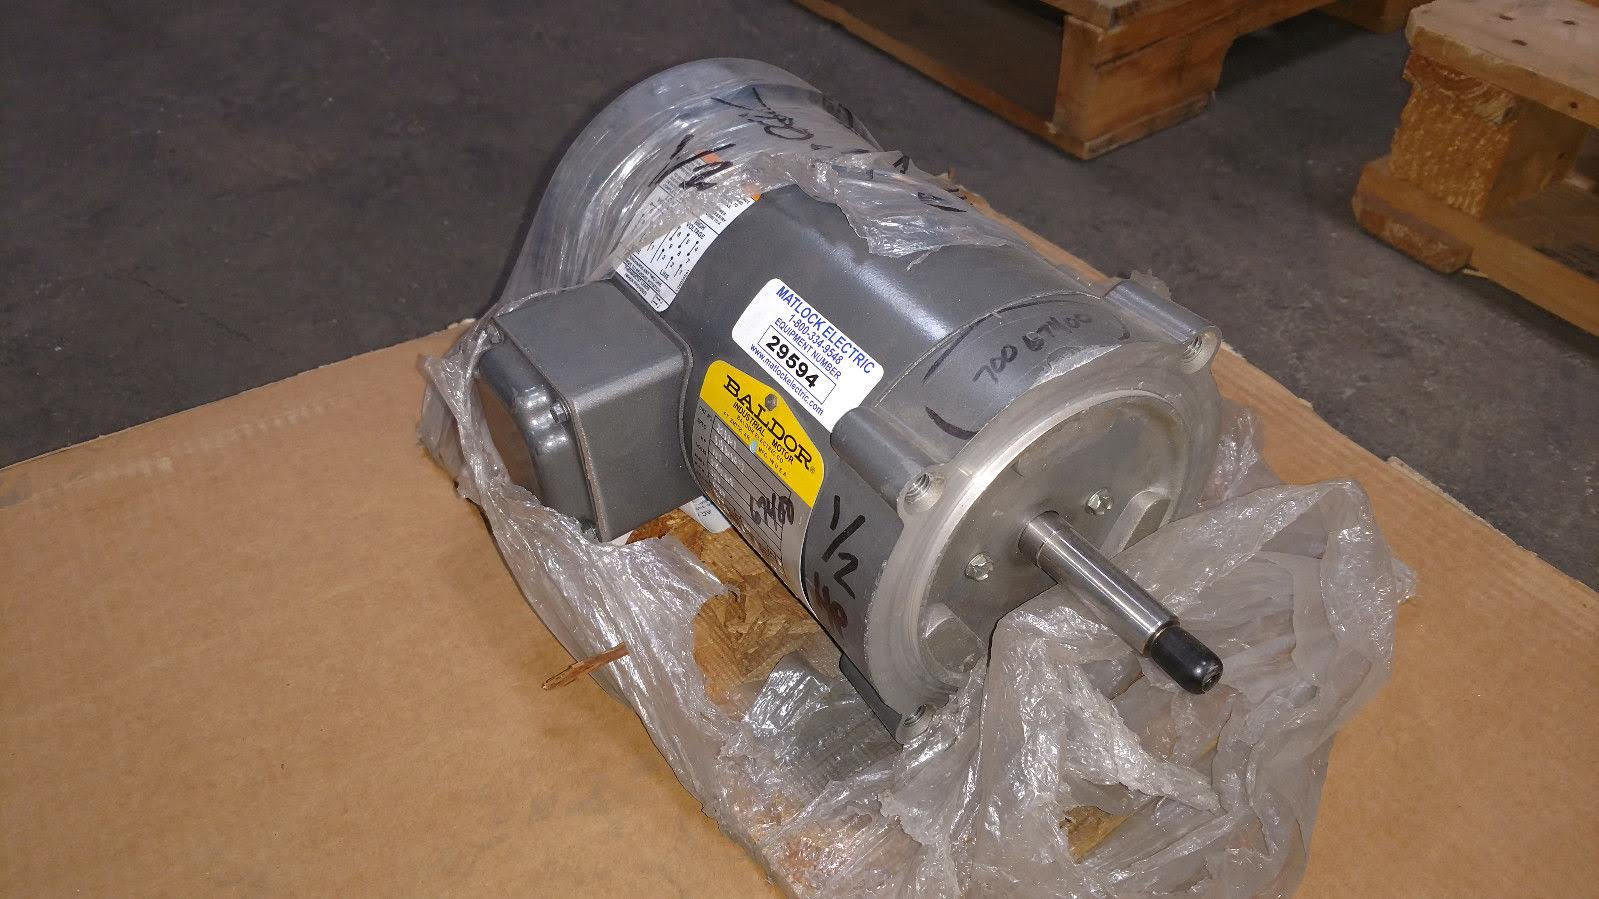 Lot 45 - (1) *NEW* Baldor Industrial Motor 1/2HP 1725RPM 230/460V 34K36-872 *NEW*